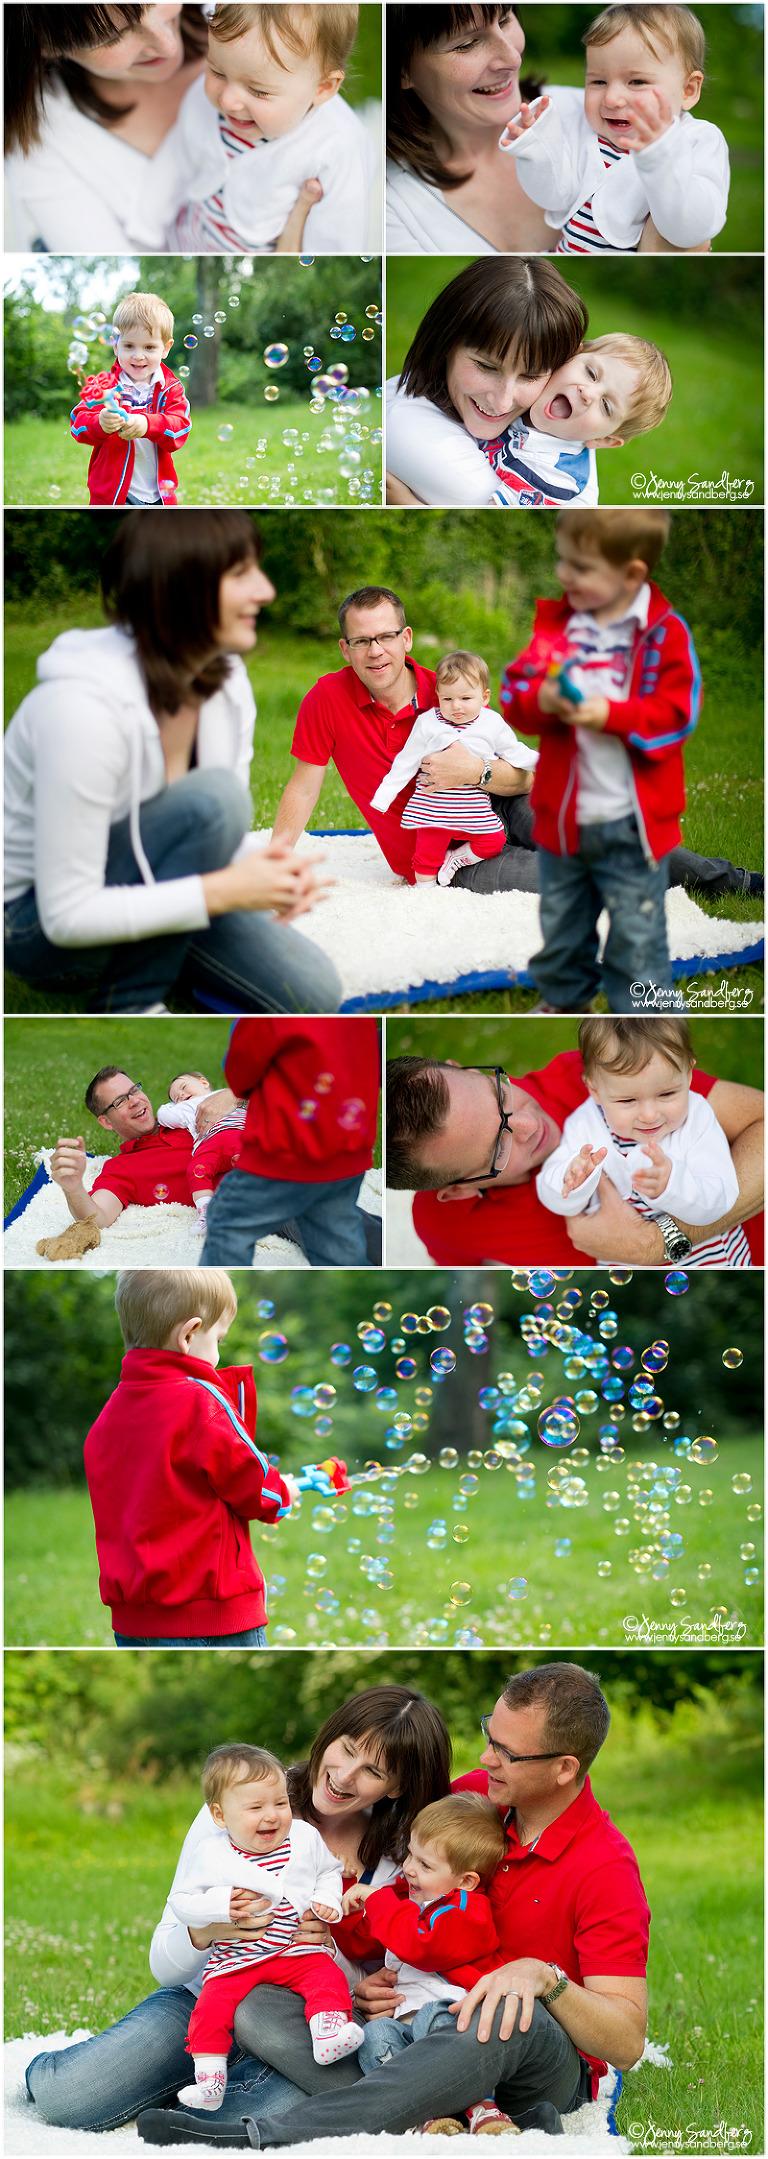 Barnfotograf Lund, Familjefotograf Lund, Barnfoto, Babyfoto, Familjefoto Lund, Familjefotograf Malmö